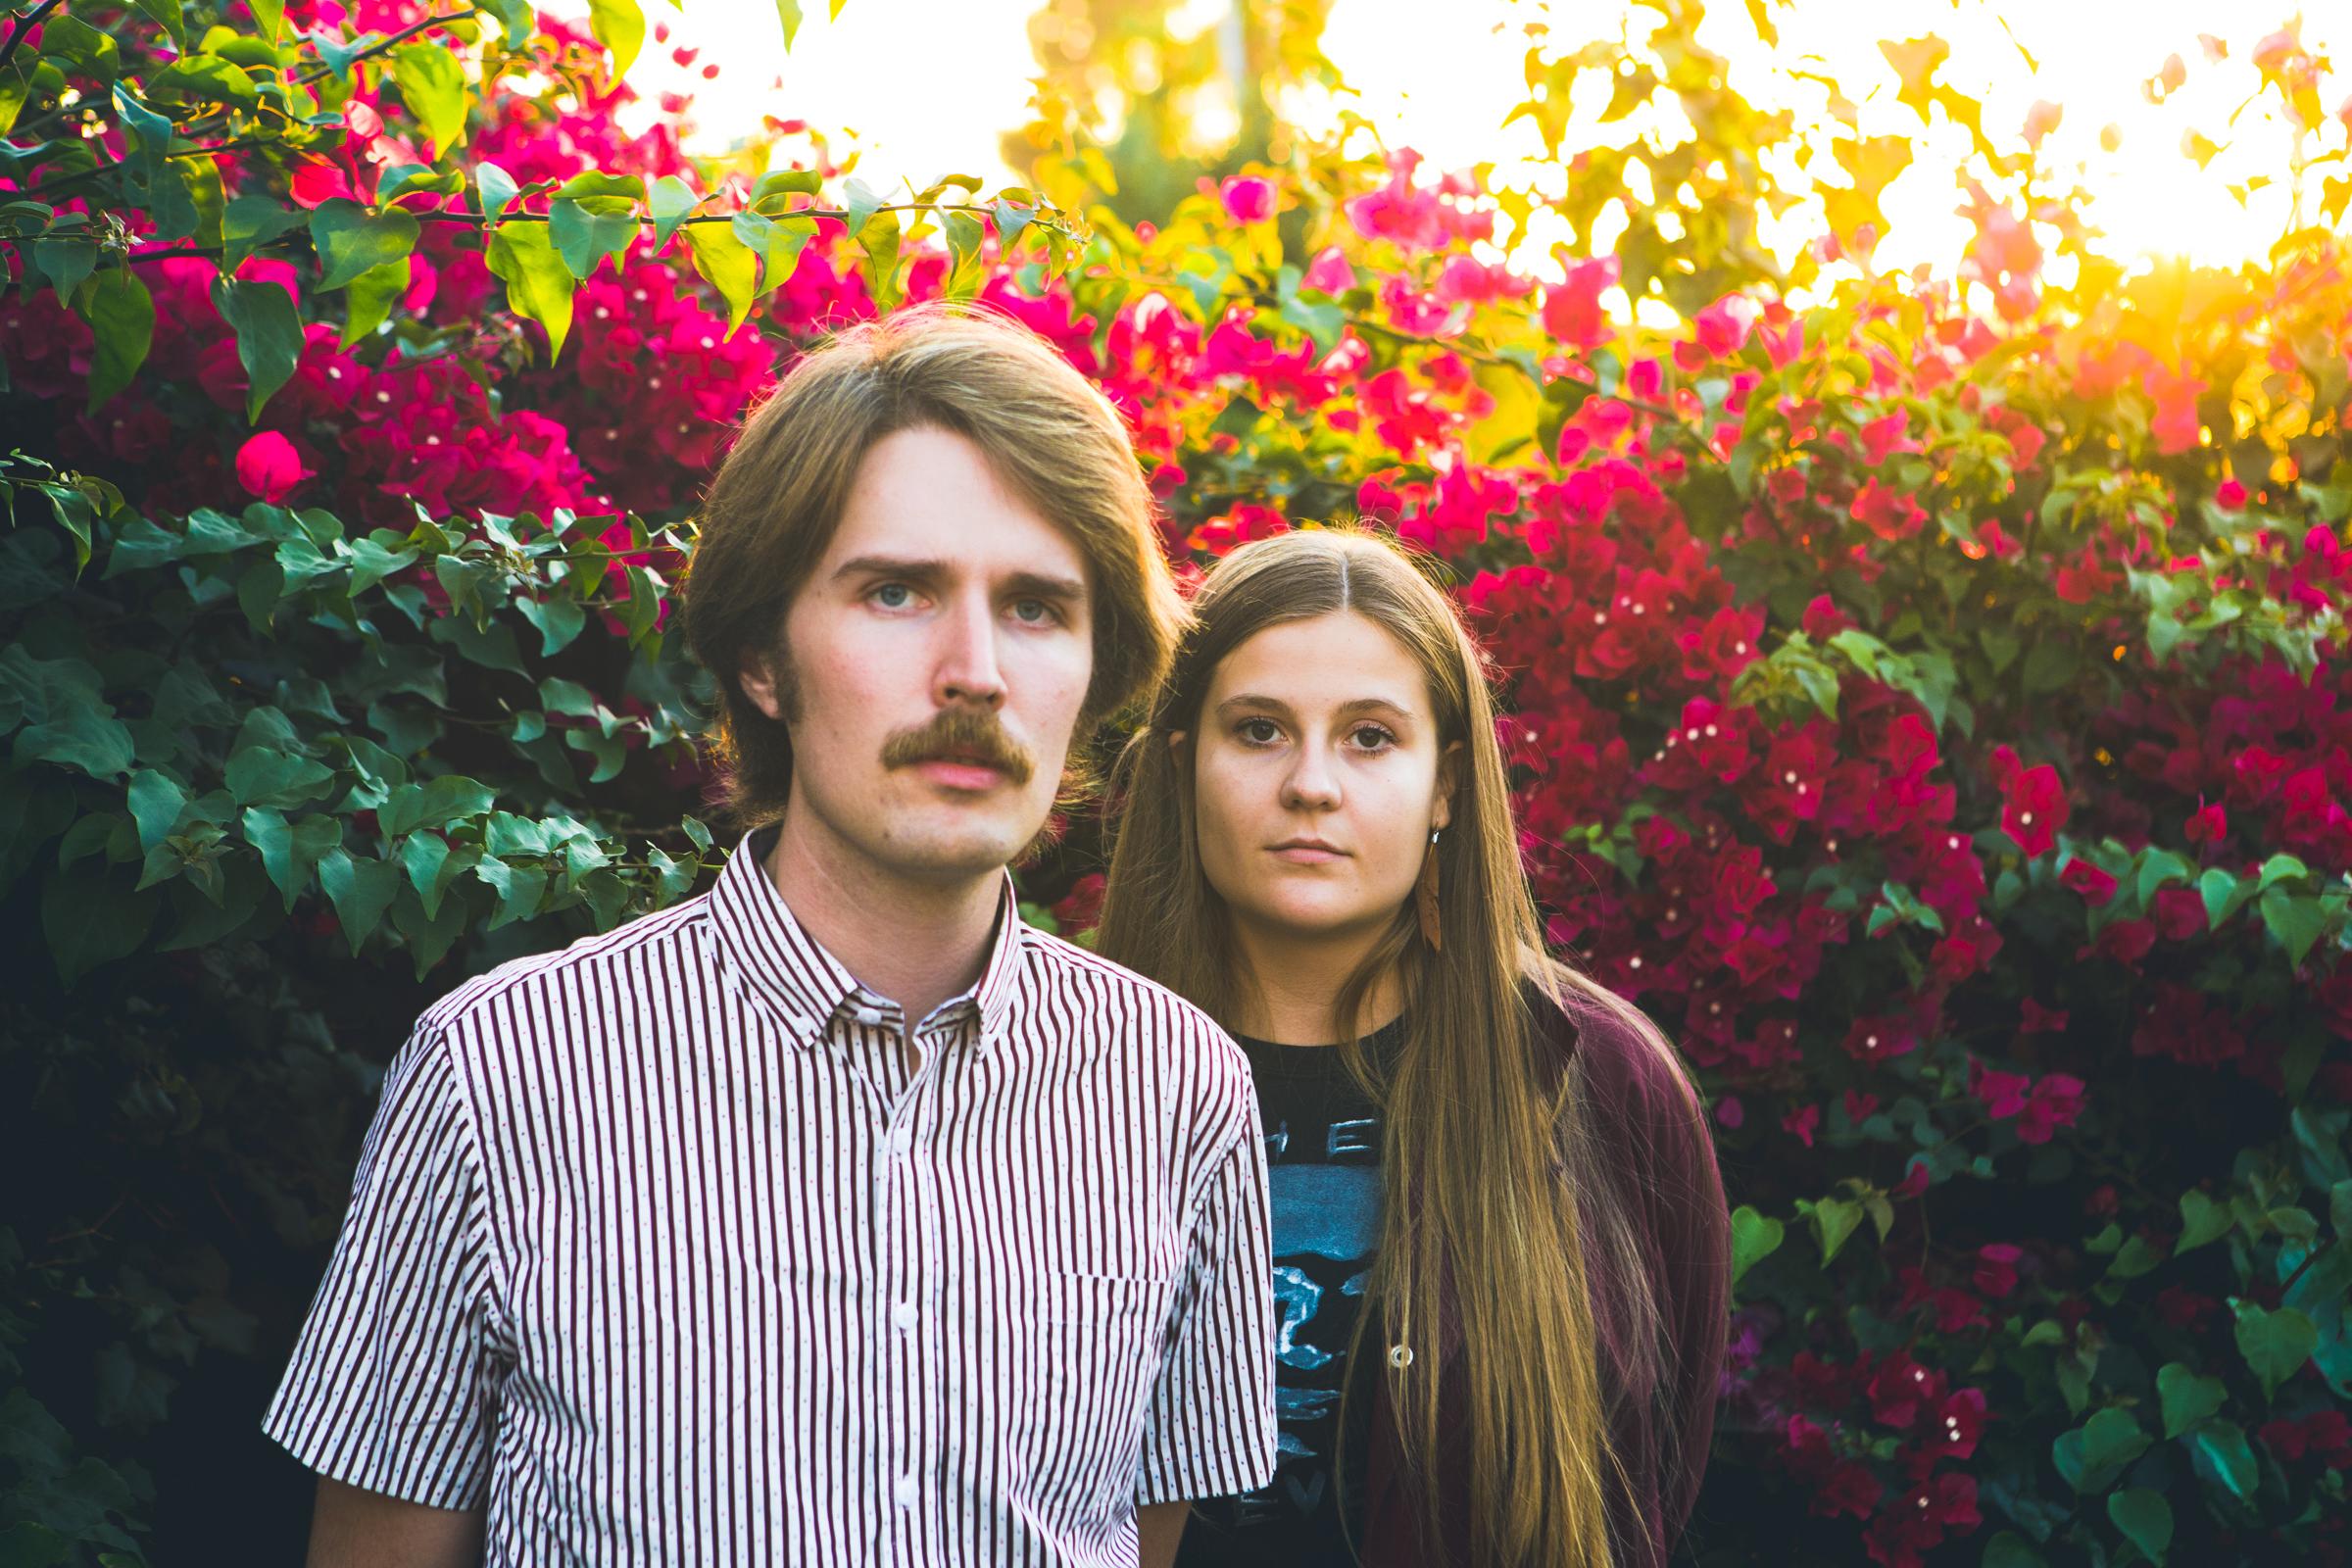 Kacy & Clayton Photo By Mat Dunlap   Download 300 DPI JPG